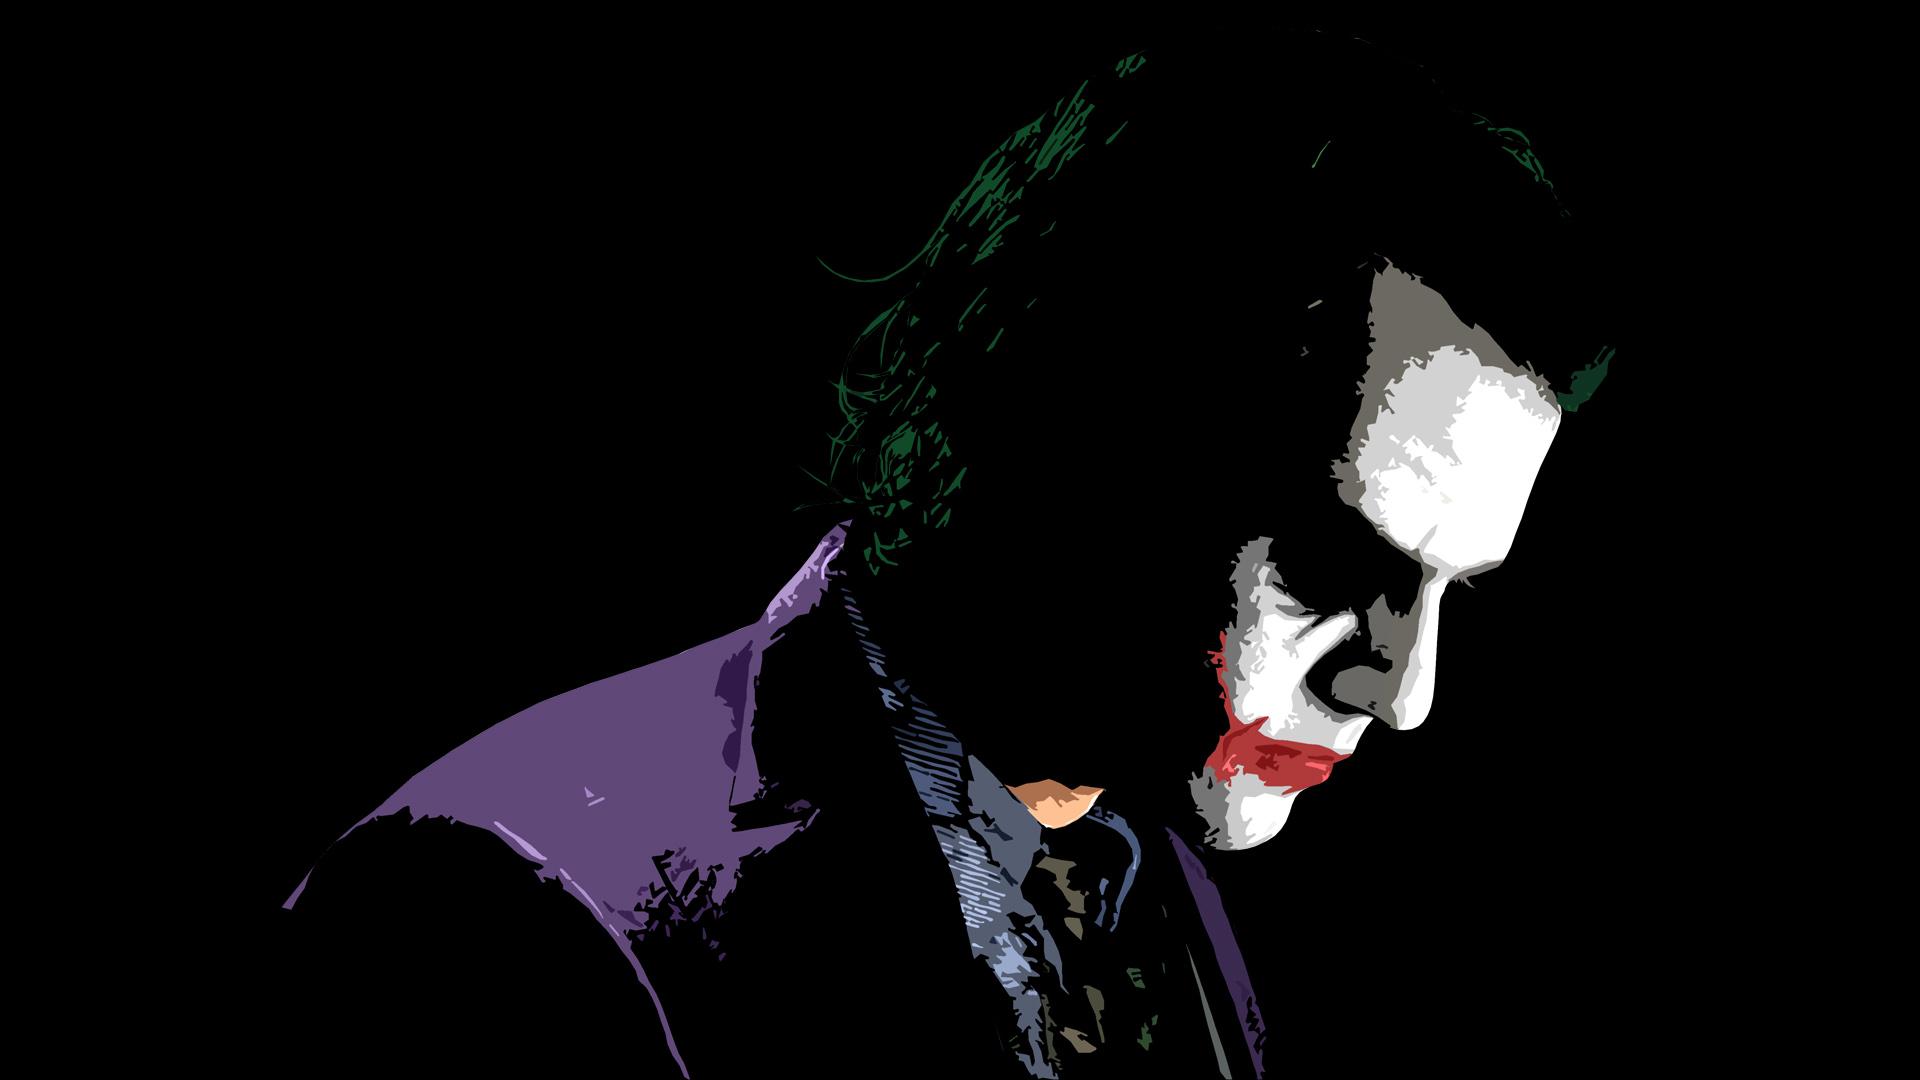 Joker Wallpaper by Gjhdhgfgkutf jpg 265708 1920x1080